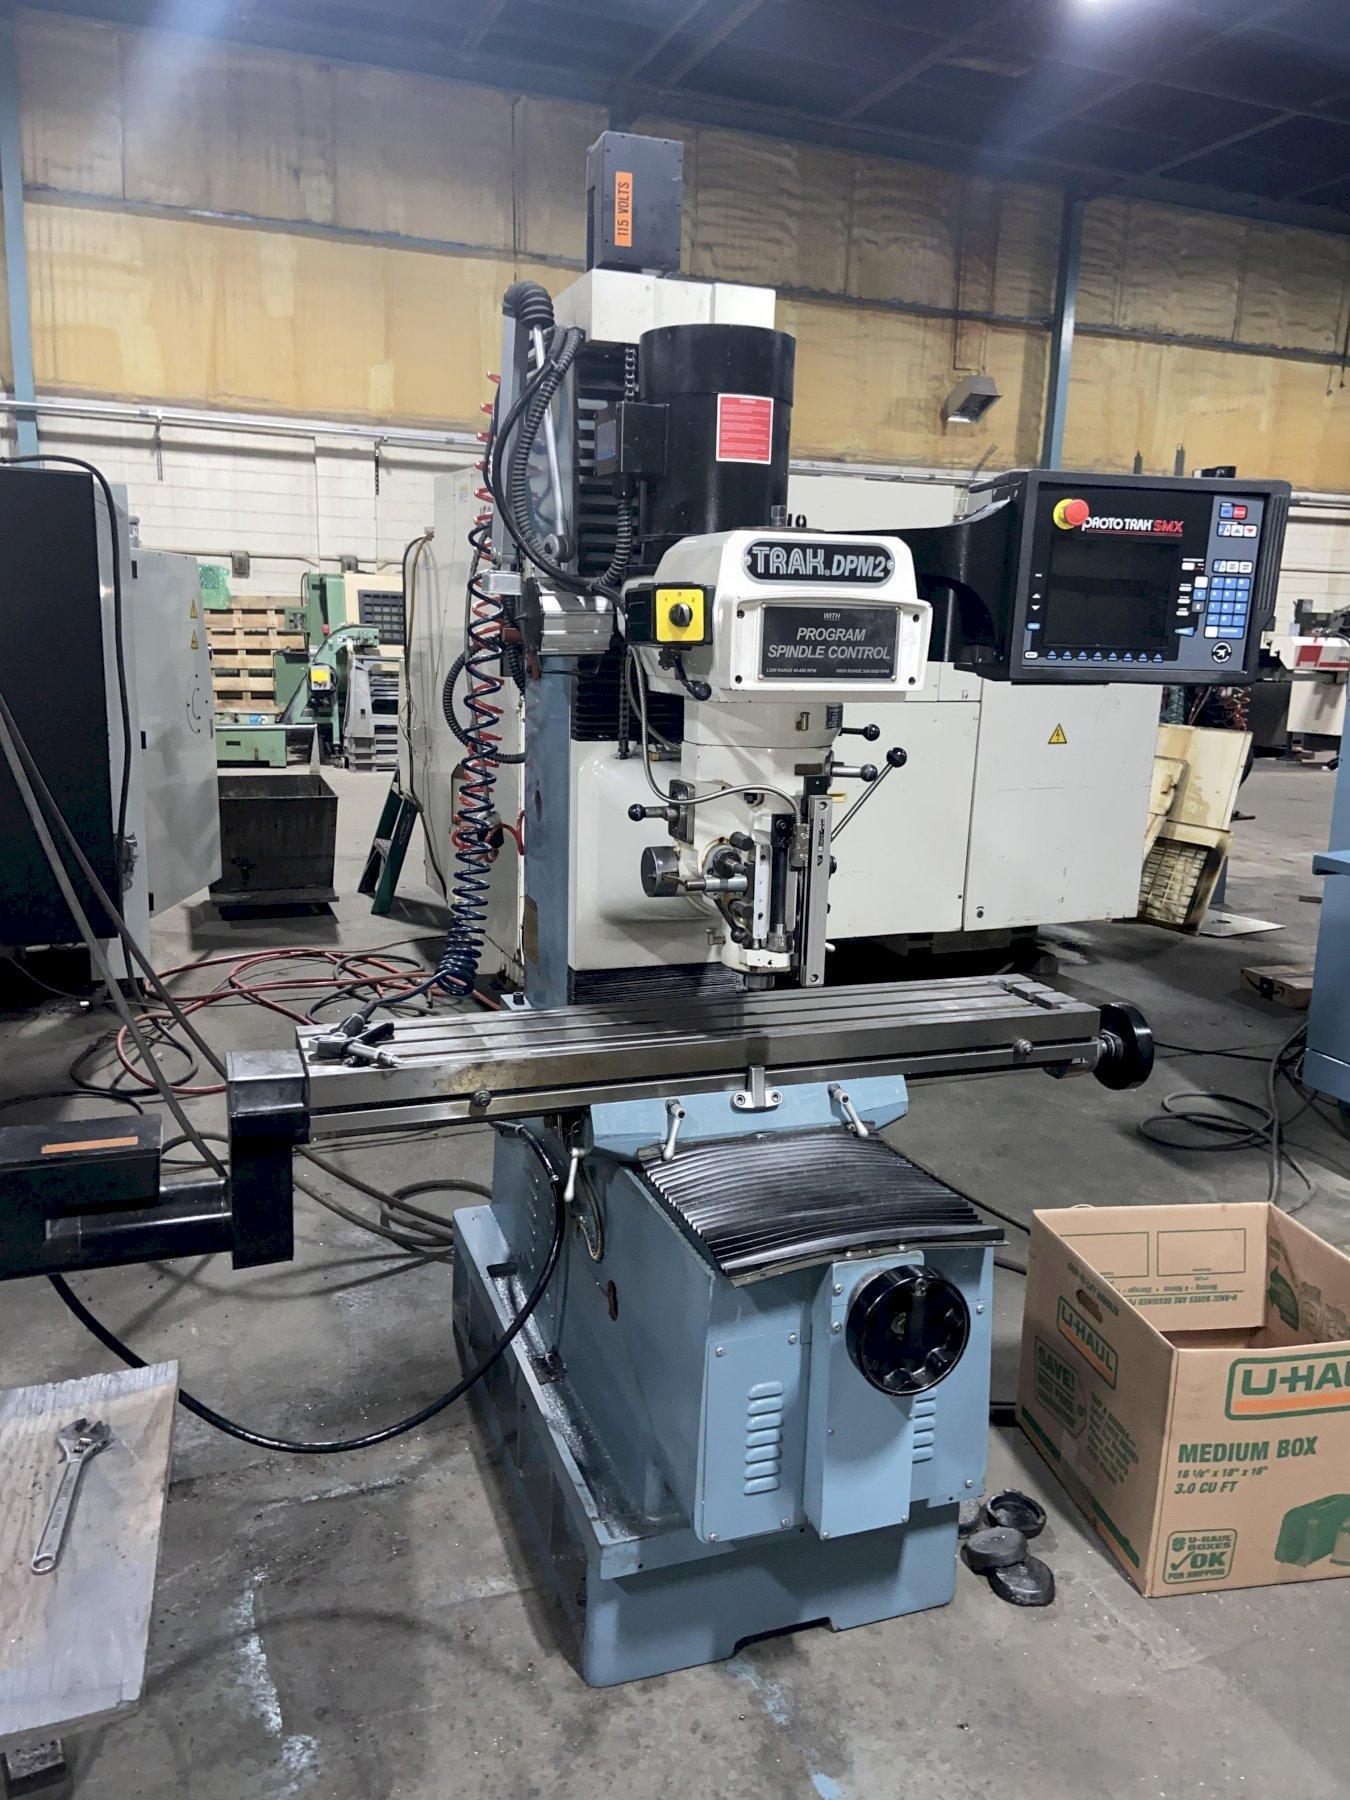 Southwestern Industries DPM2 CNC Mill, Prototrak SMX Control, 9